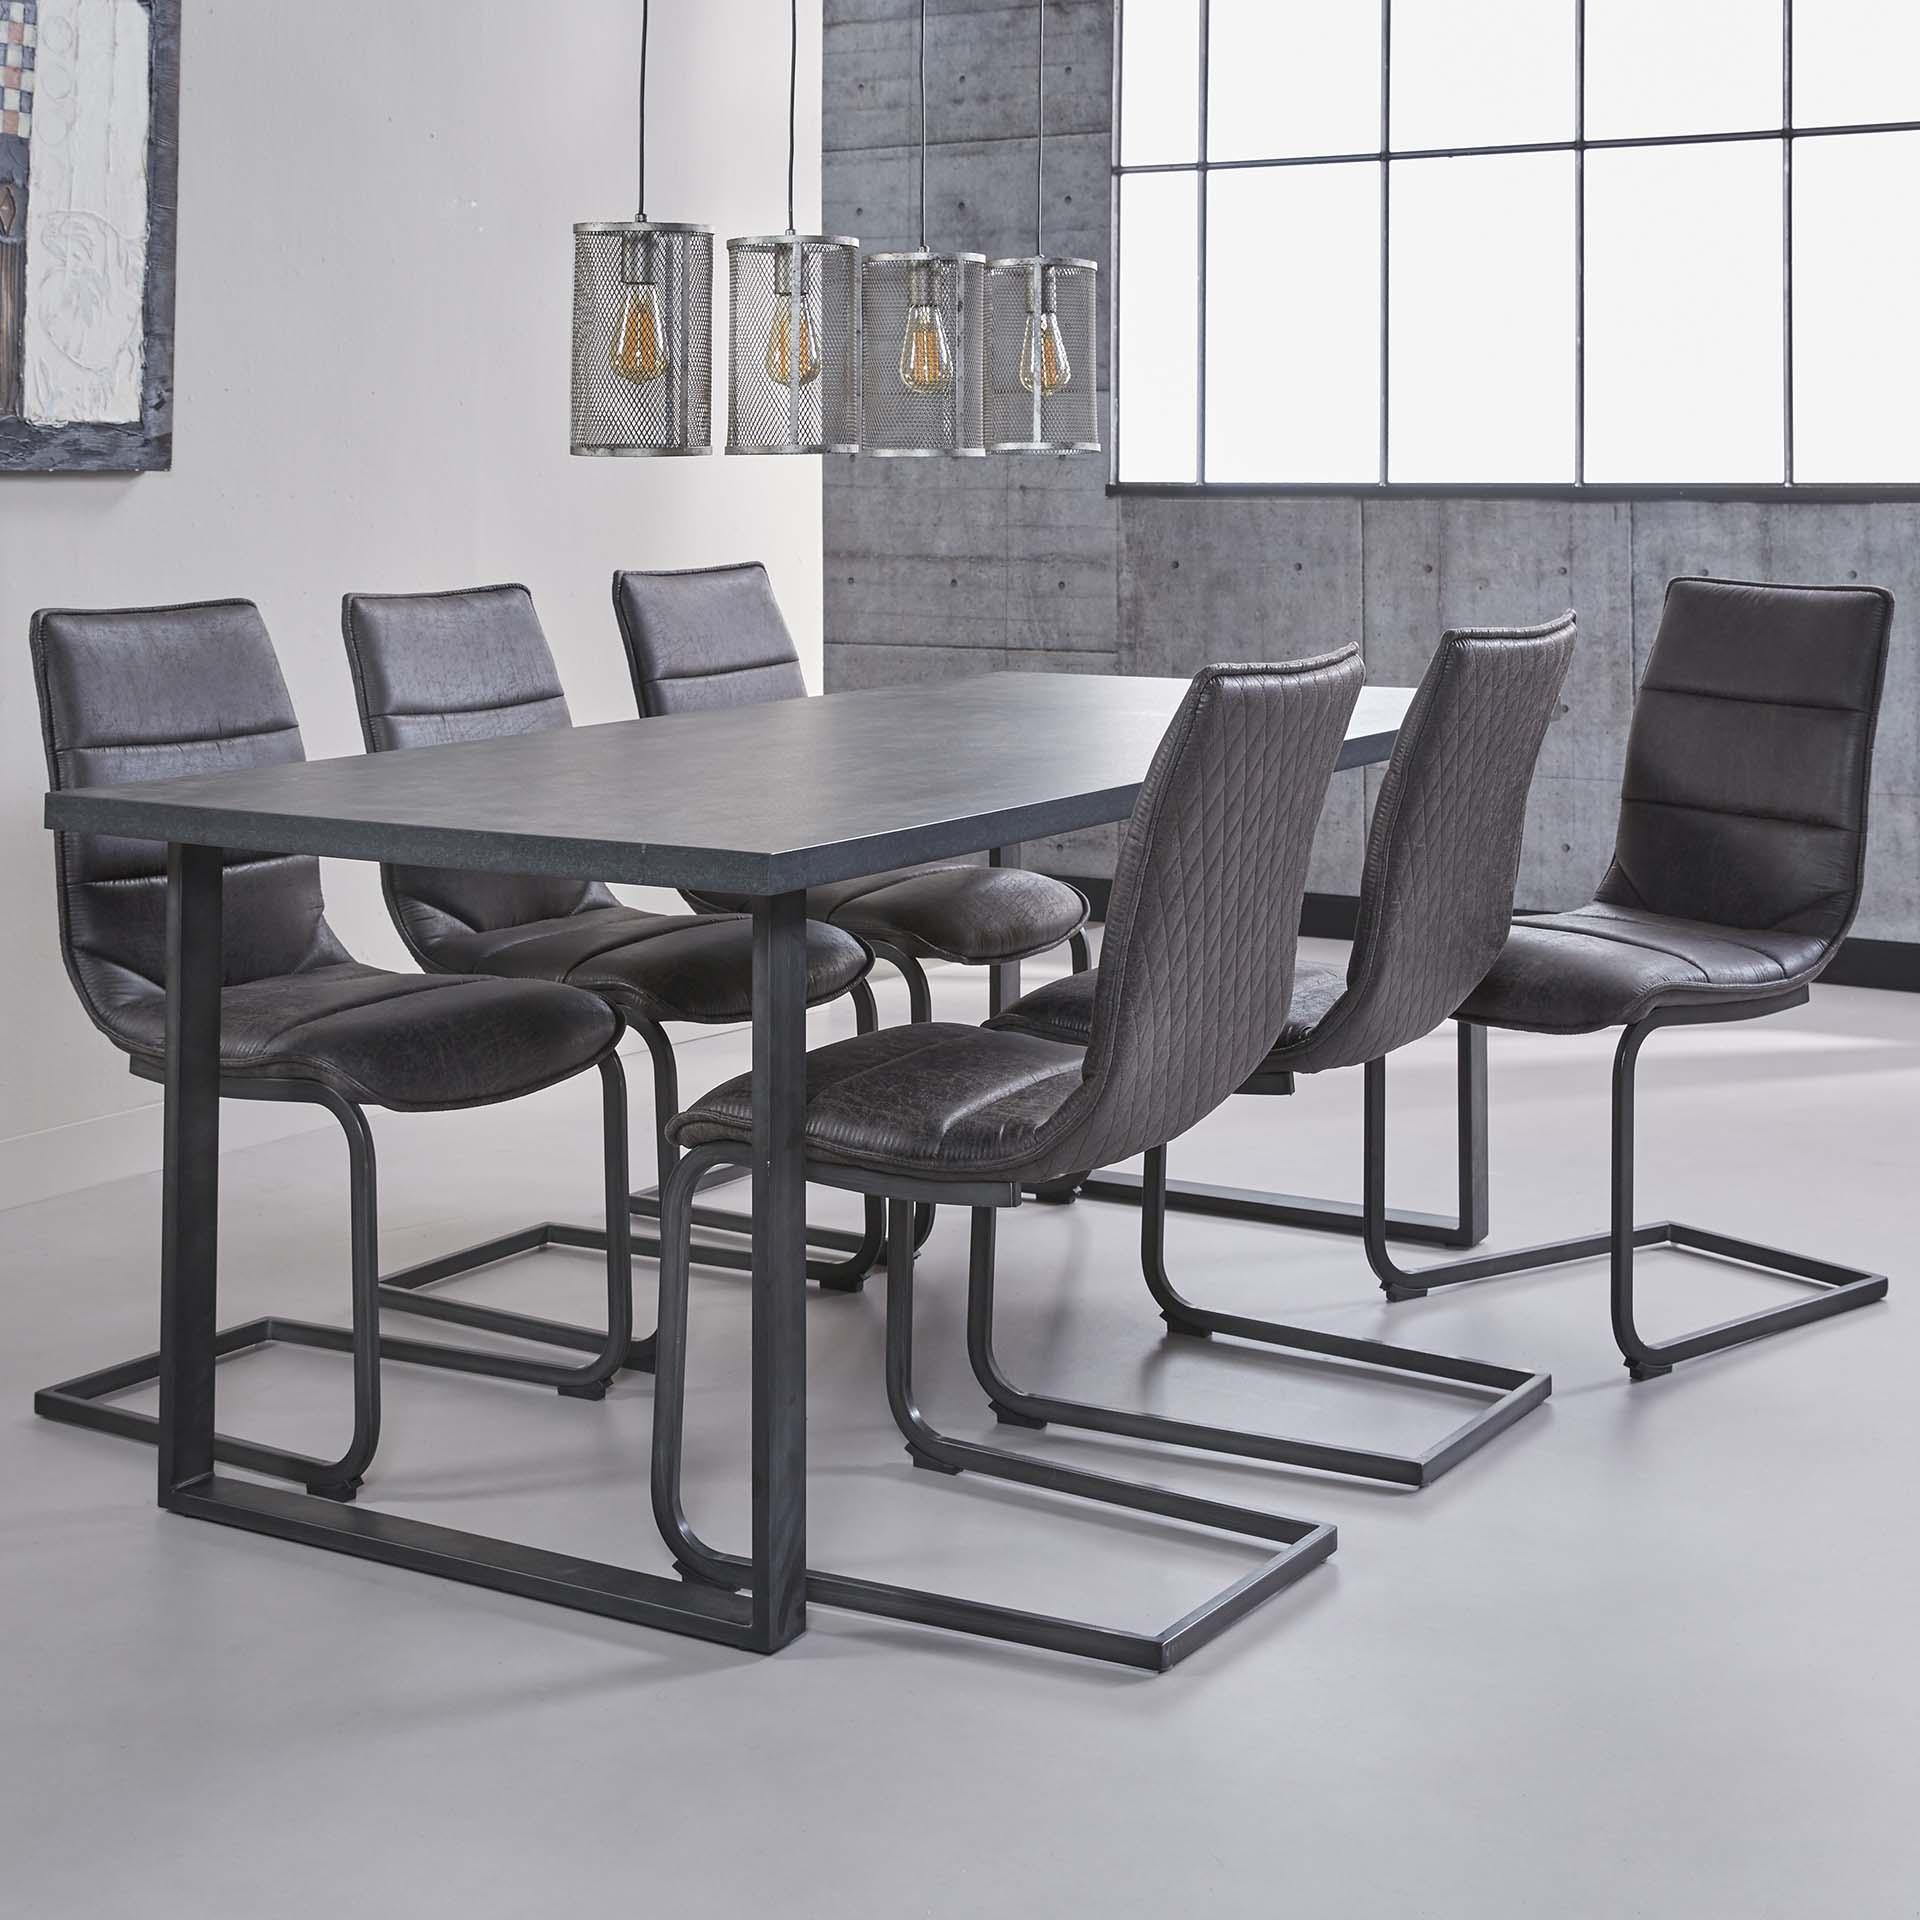 Eettafel 'Alan' zwart/bruin 190 x 90cm